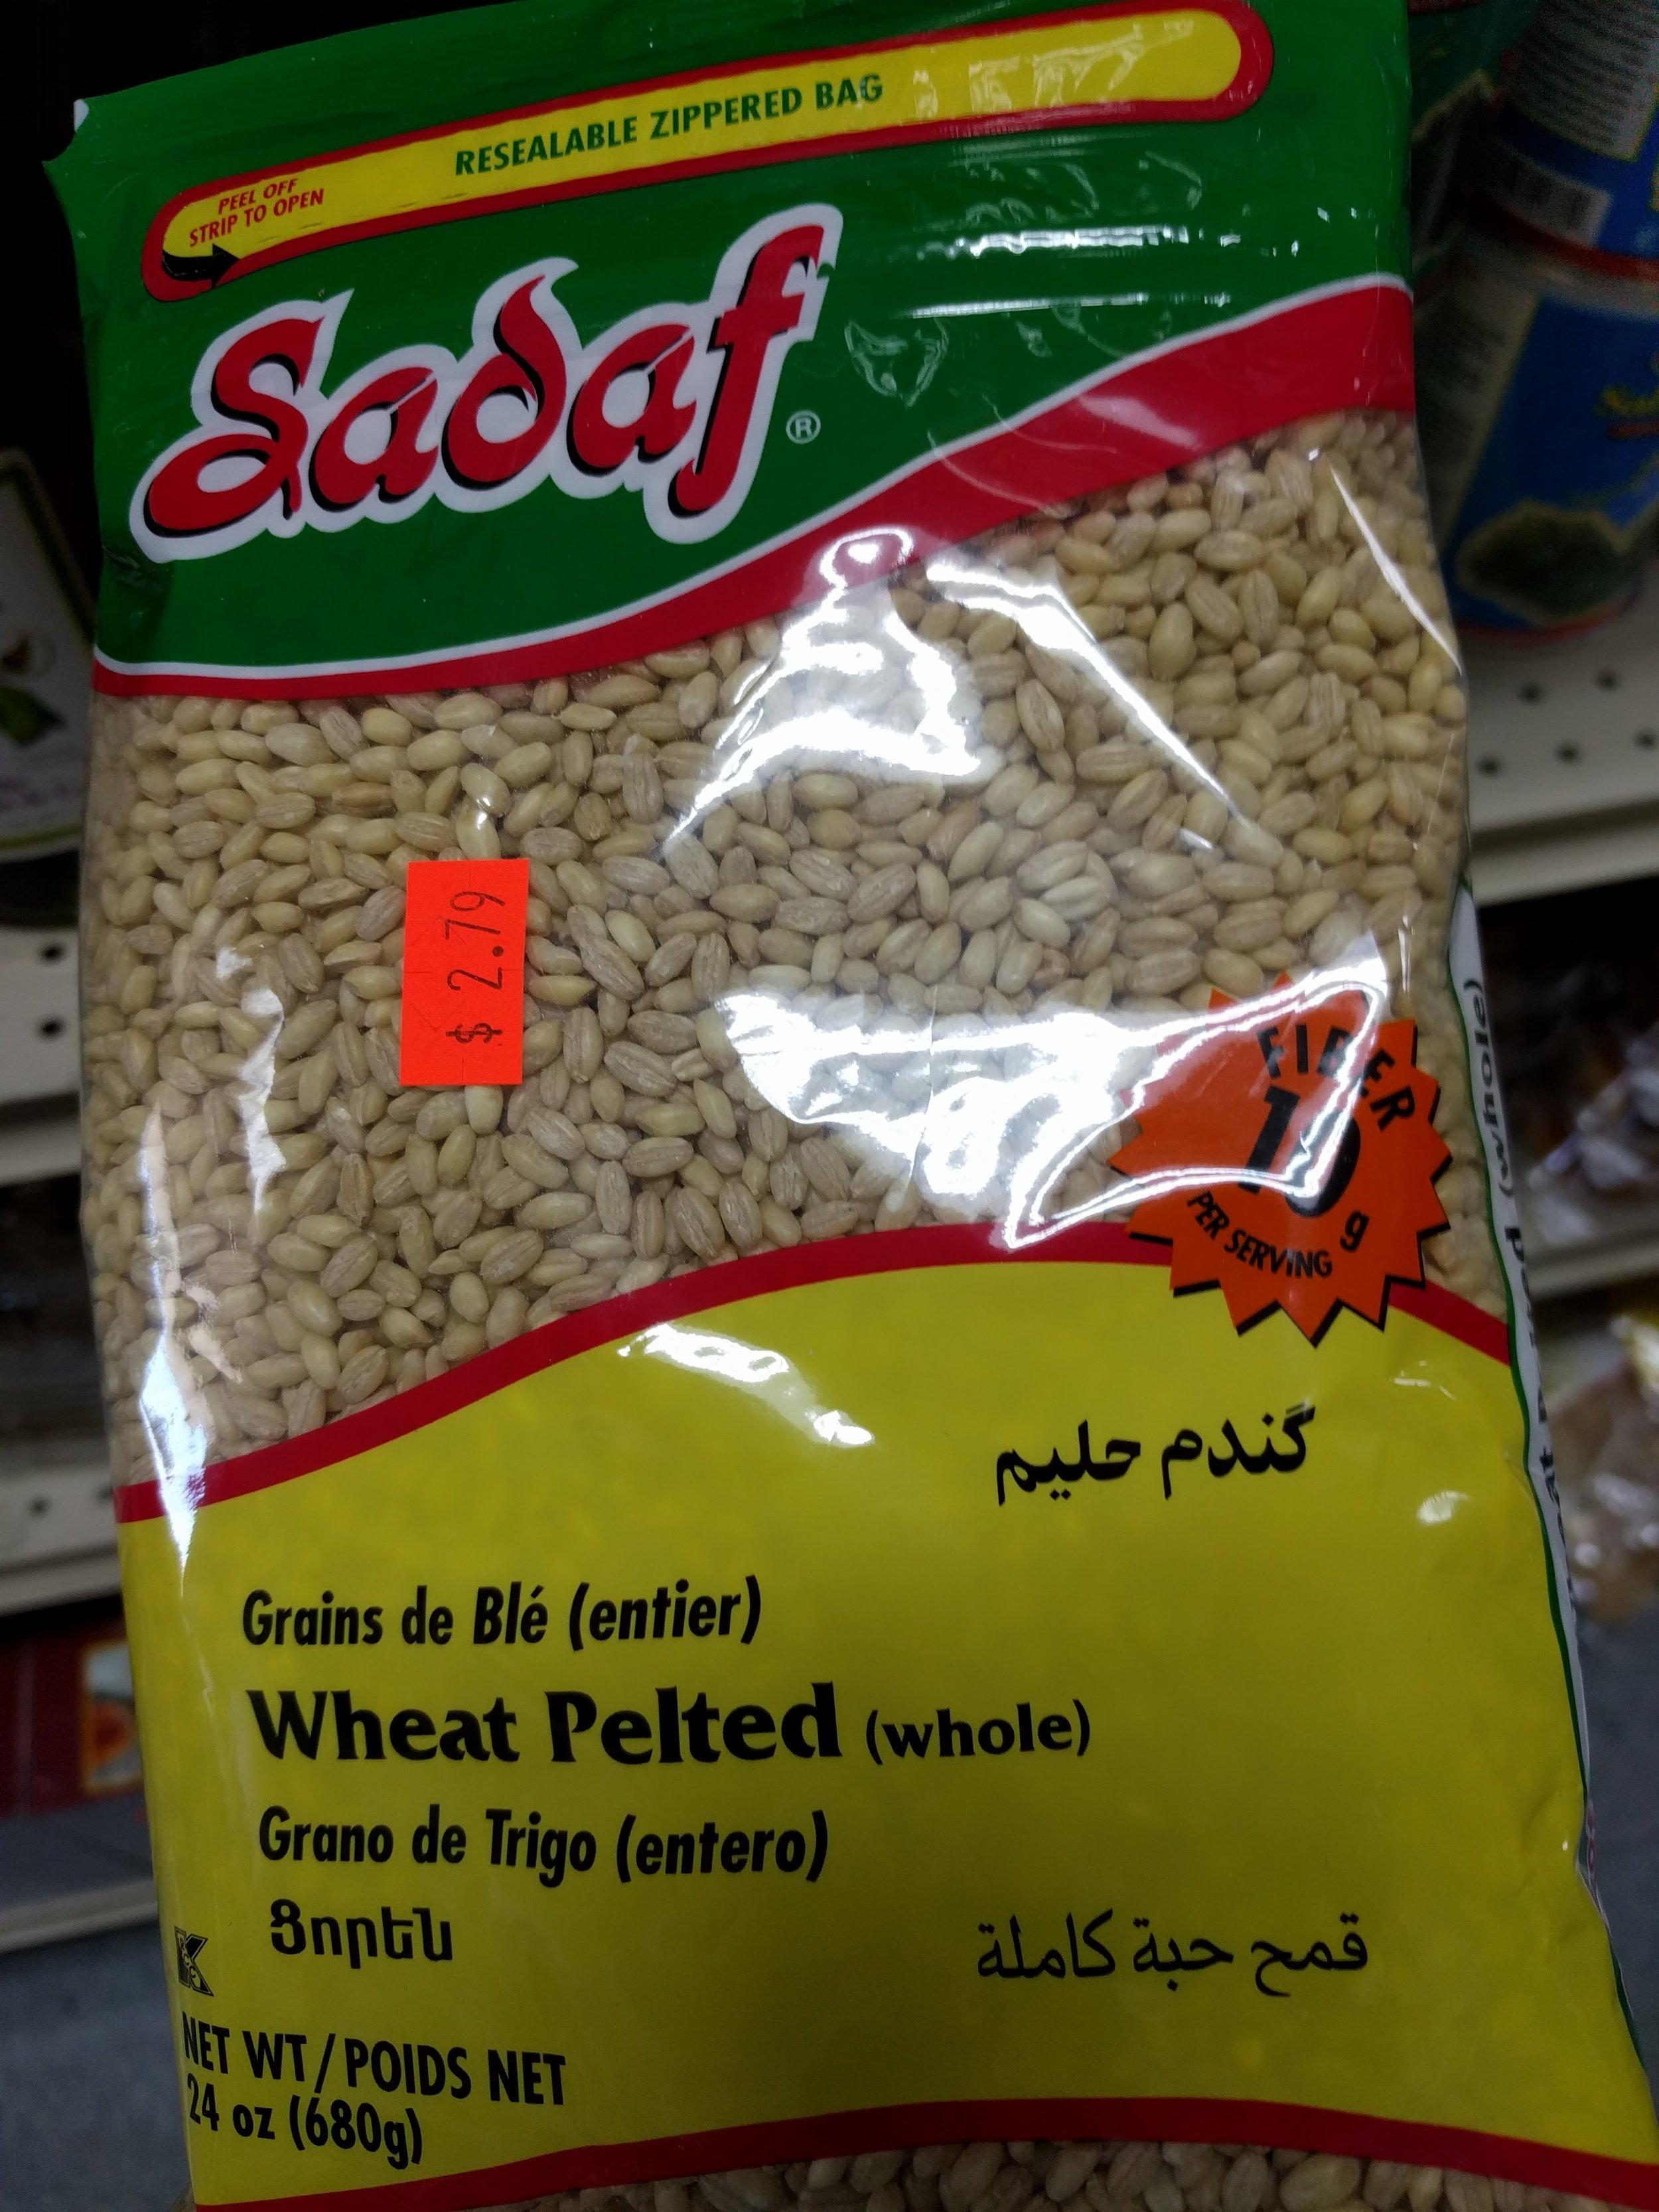 Wheat-Pekted-Whole-Pak-Halal-International-Foods-12259-W-87th-St-Pkwy-Lenexa-KS-66215.jpg